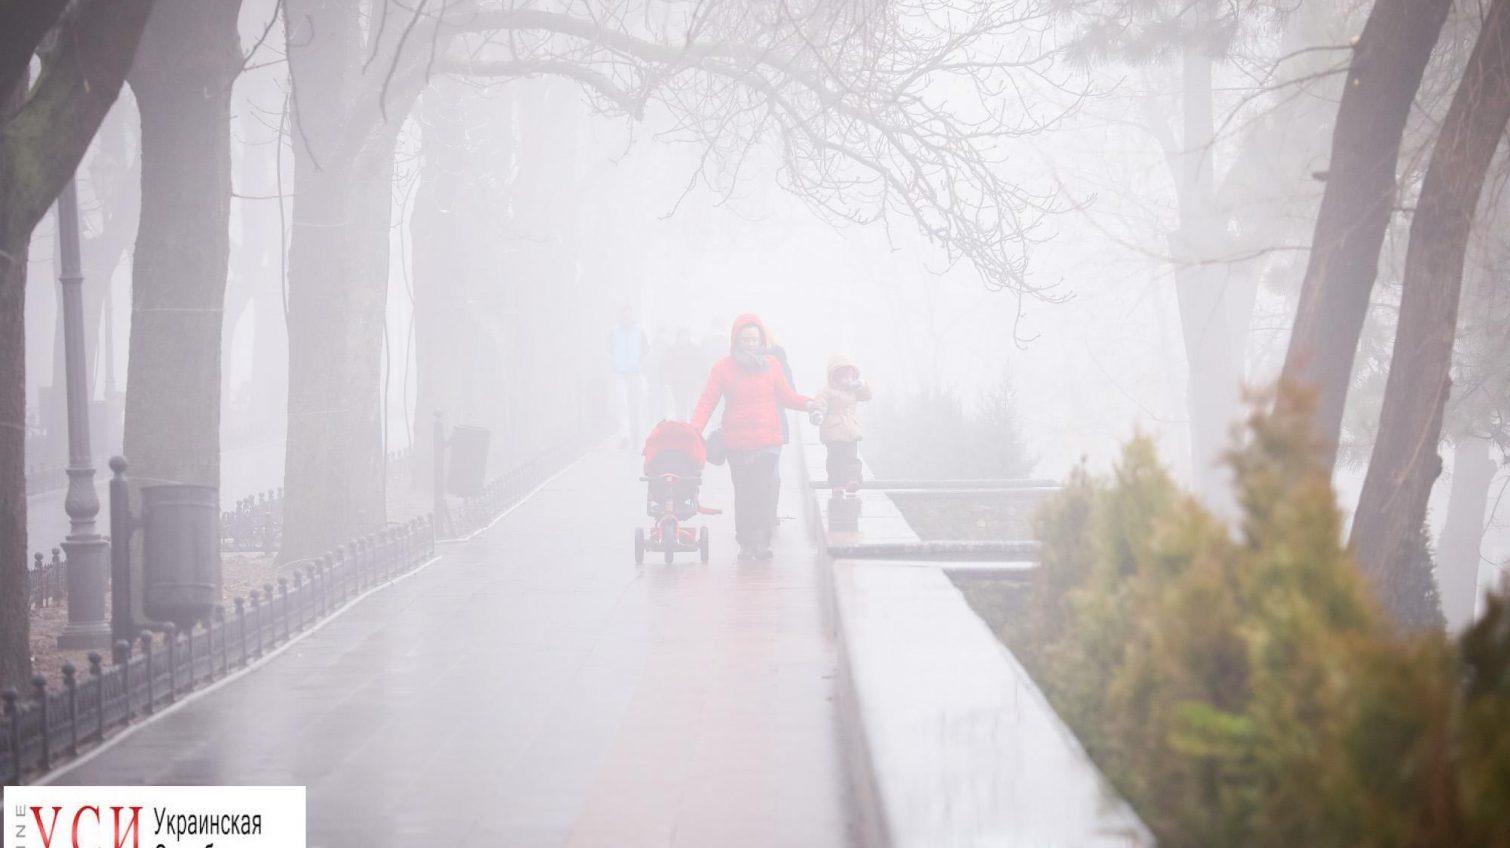 Почти Лондон: Одессу окутал густой туман (фоторепортаж) «фото»